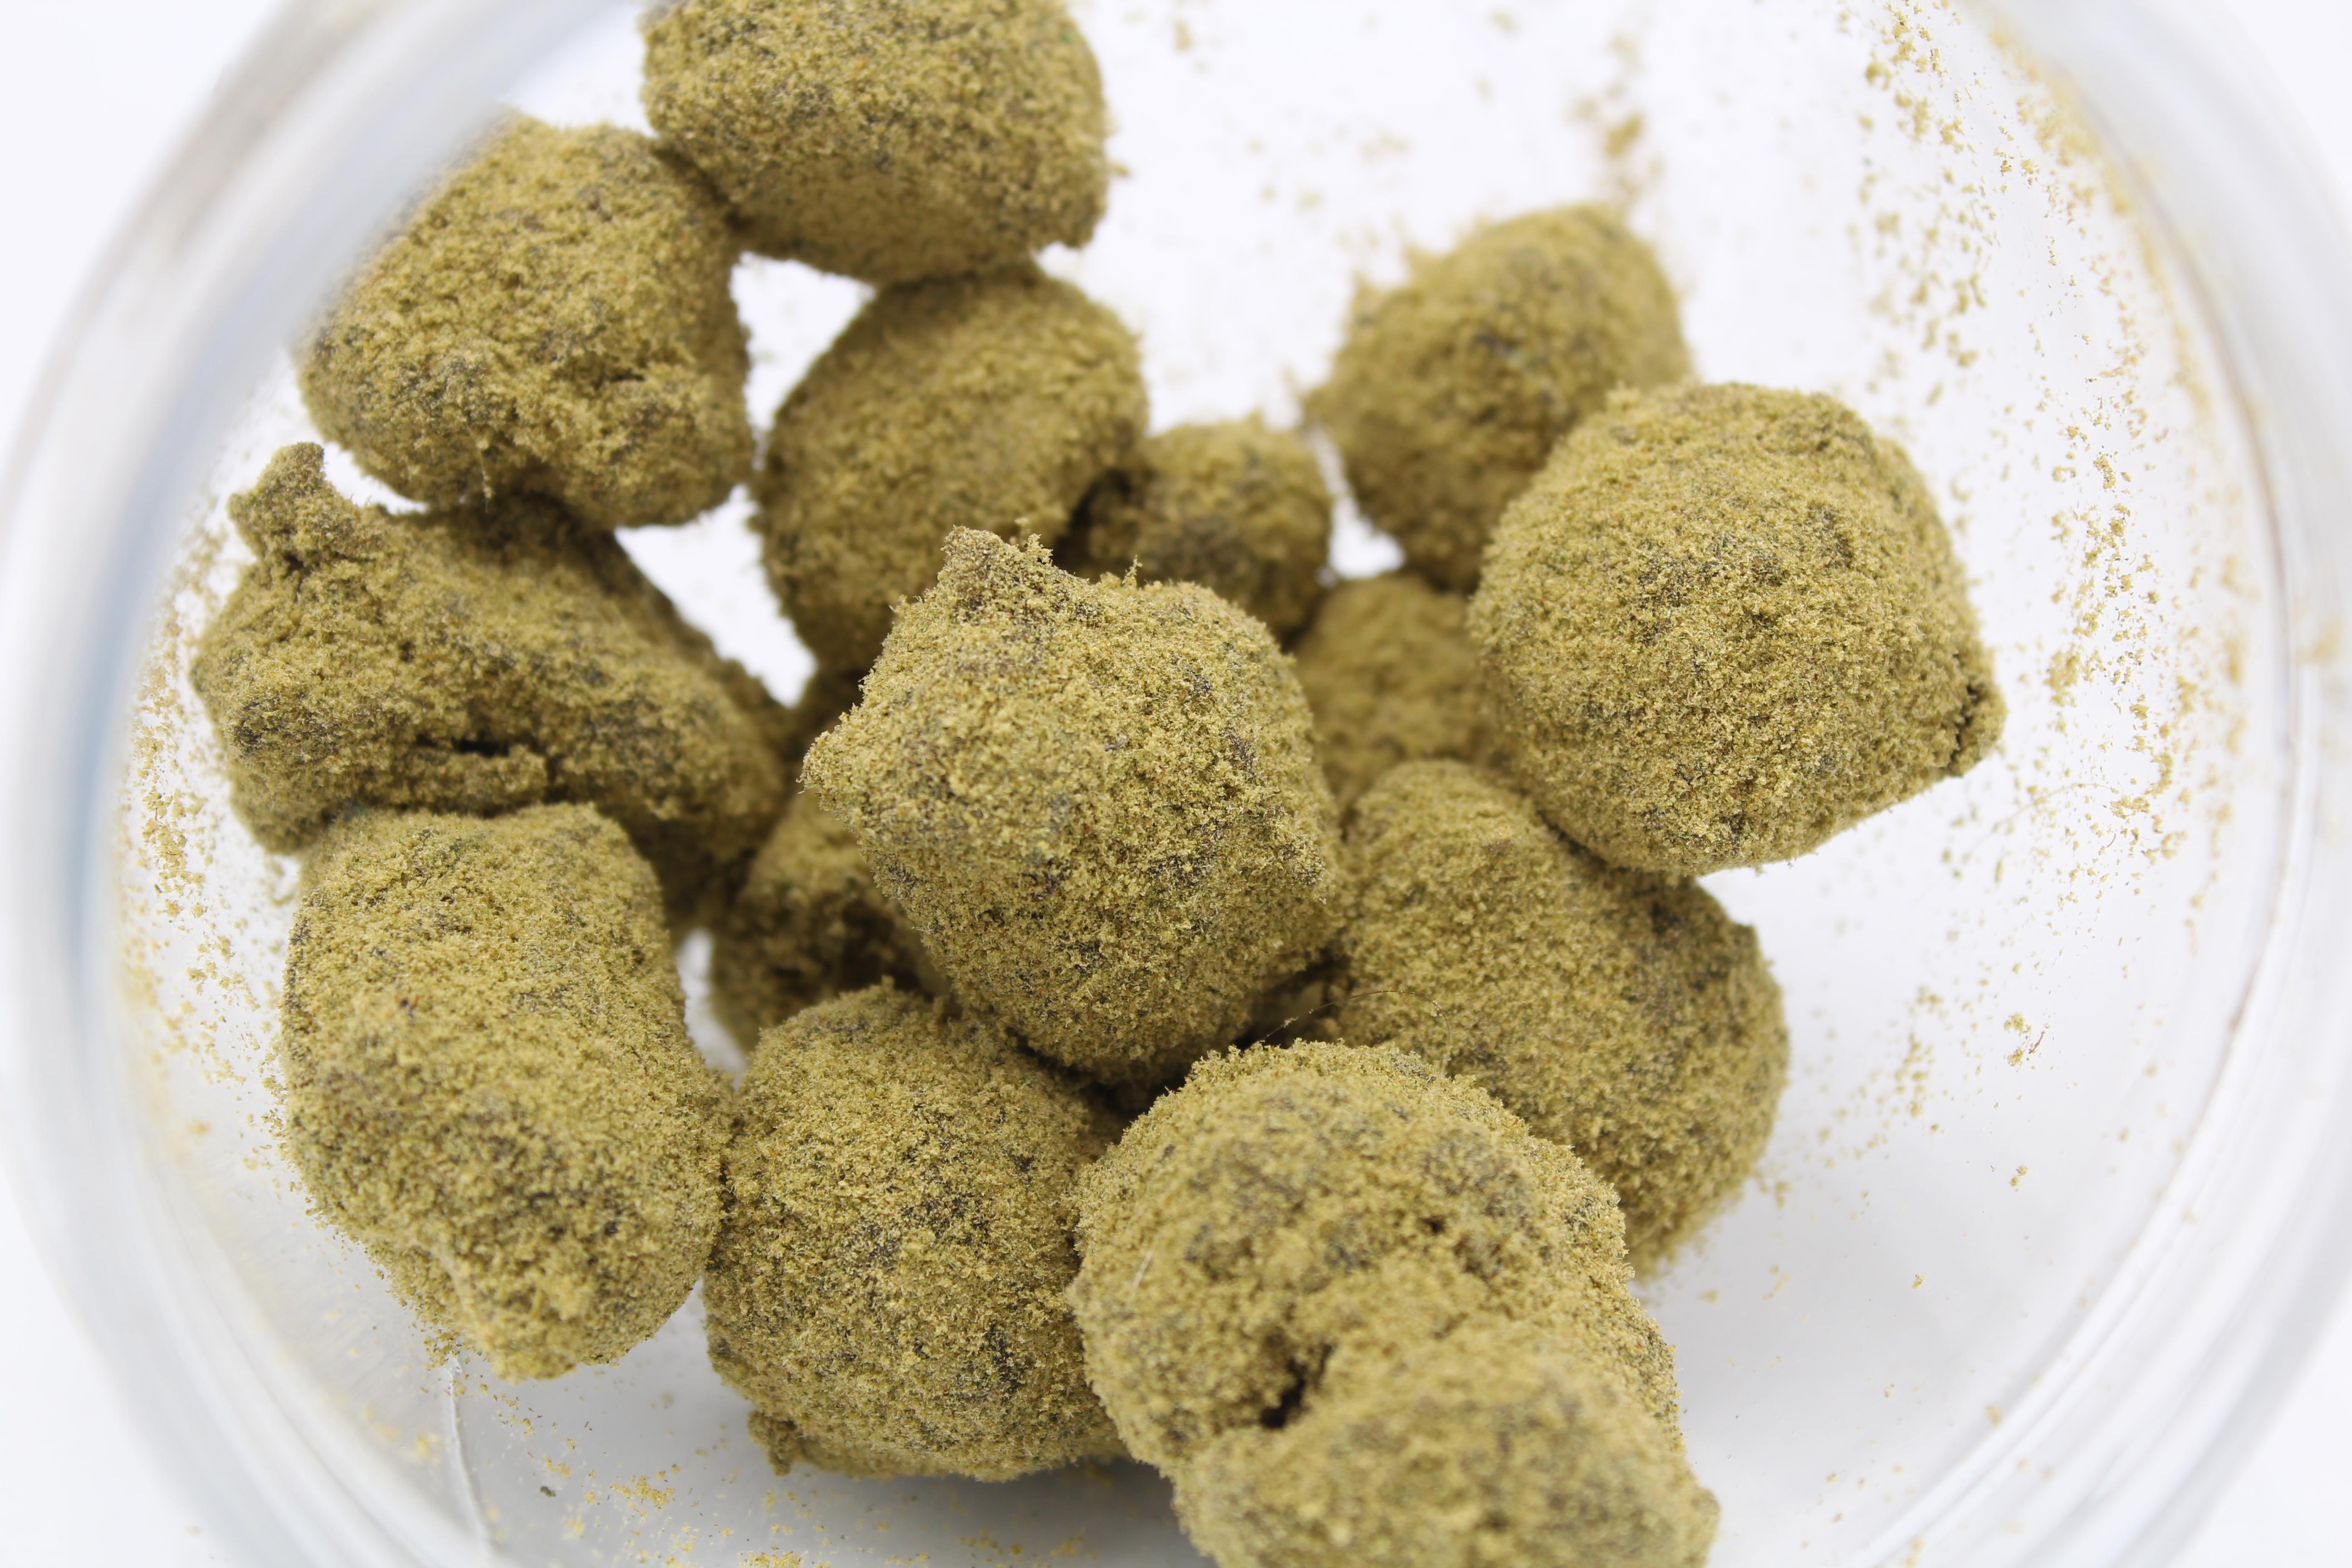 Canned Kush Sun Rocks – Kush Bomb Kief